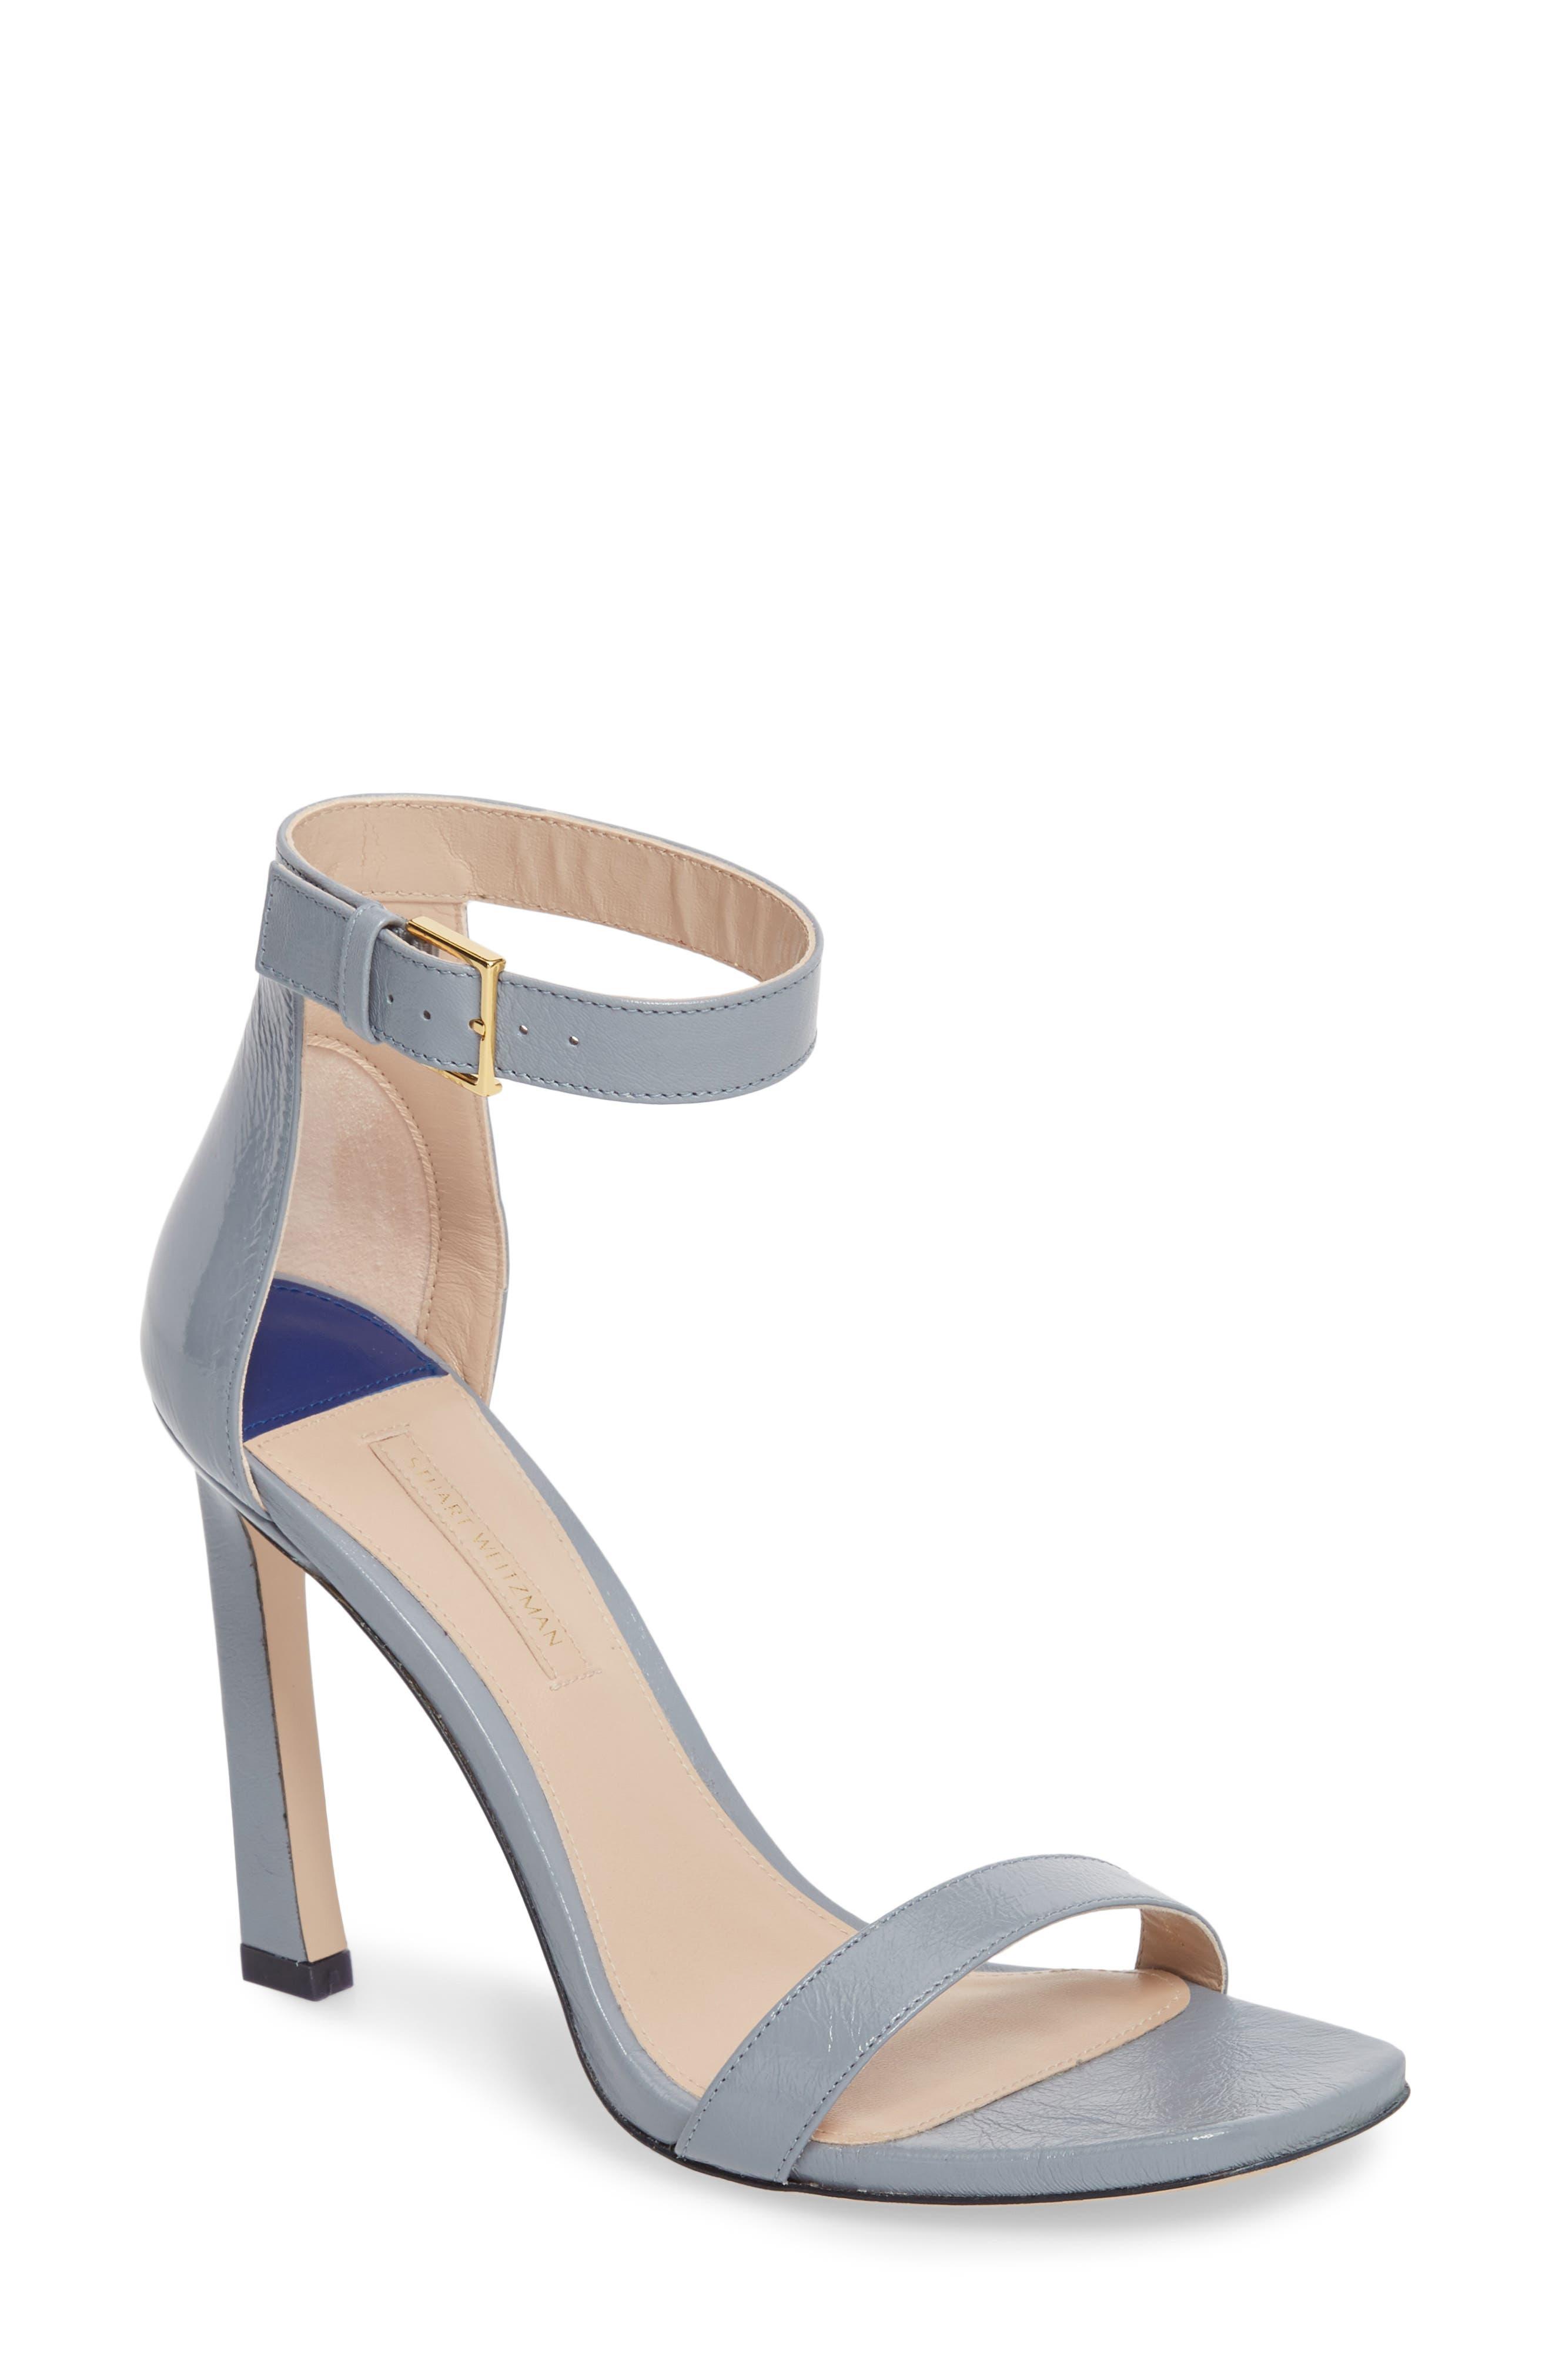 Main Image - Stuart Weitzman 100SQUARENUDIST Sandal (Women)